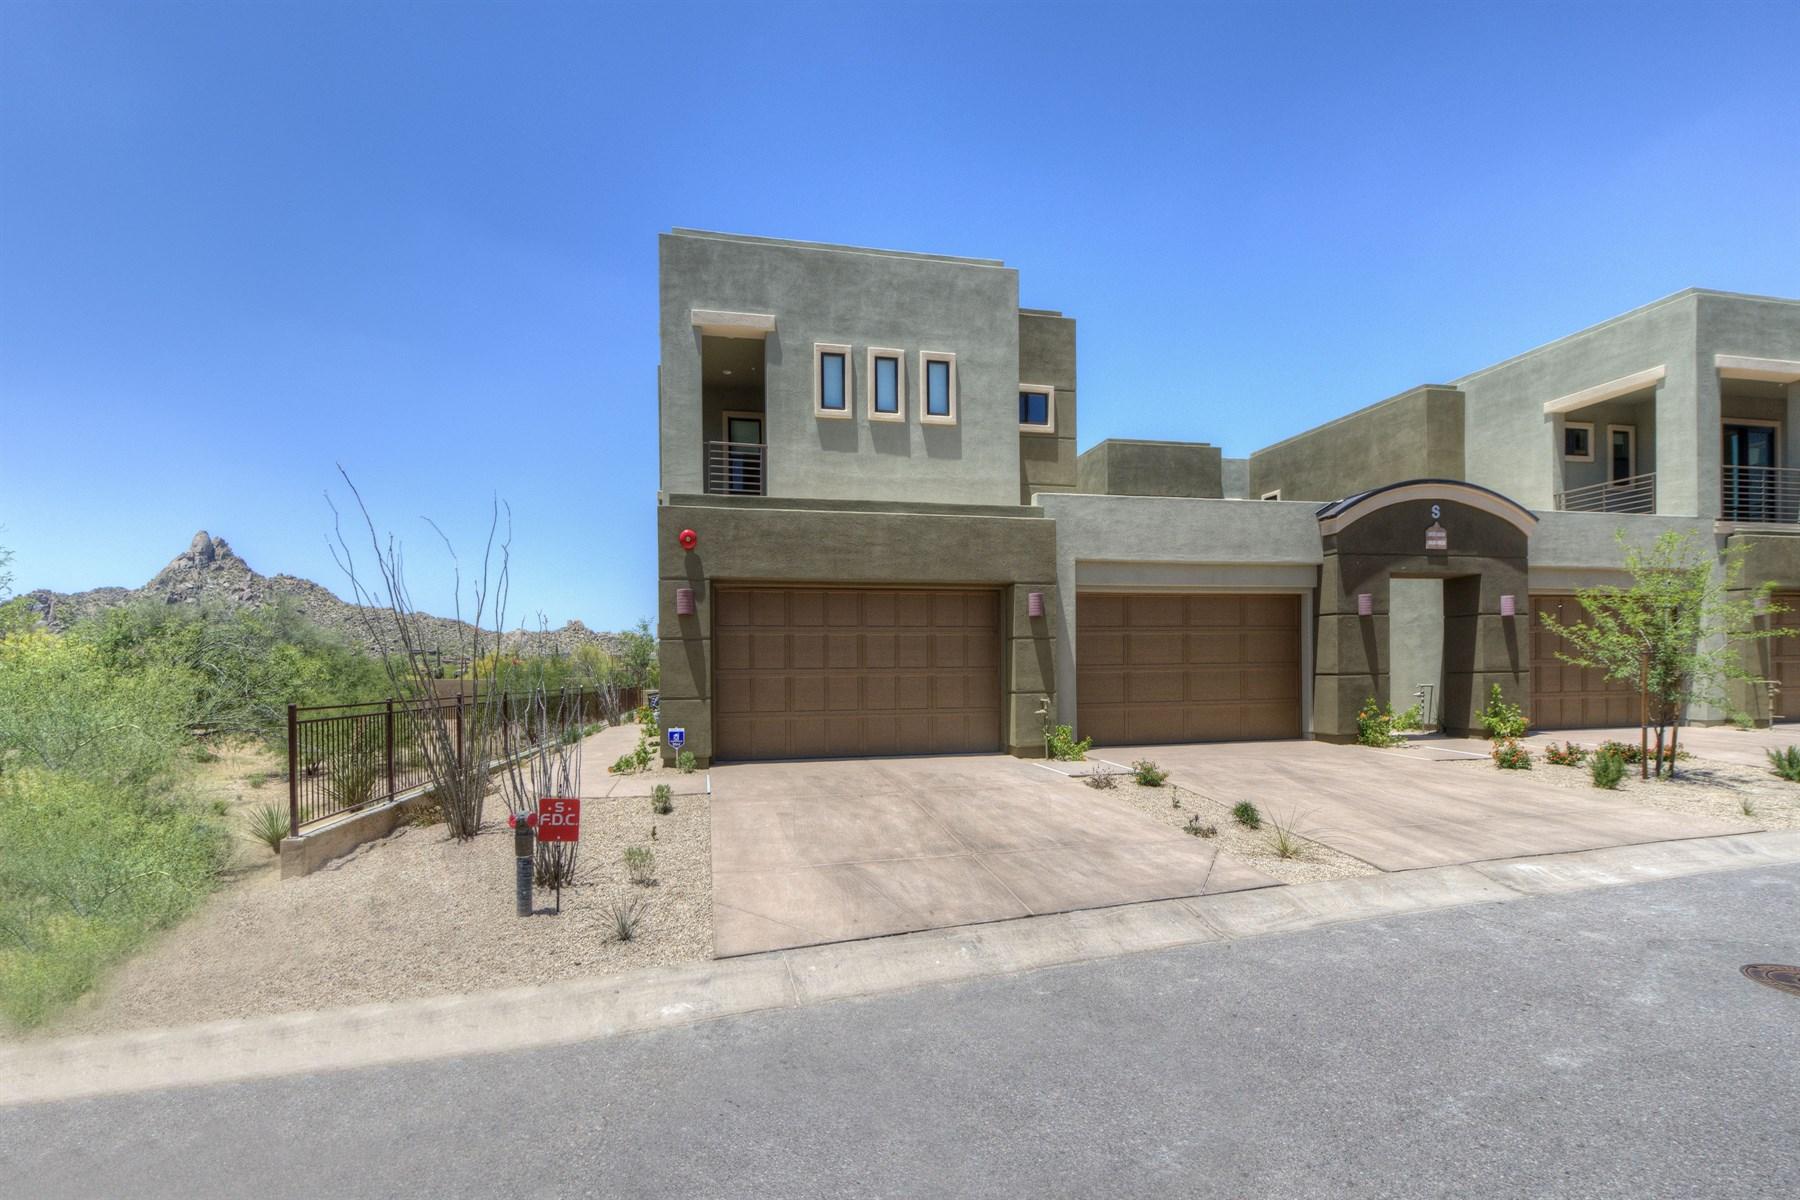 公寓 為 出售 在 New exclusive gated community 'pinnacle pointe 27000 N ALMA SCHOOL PKWY 1037 Scottsdale, 亞利桑那州 85262 美國